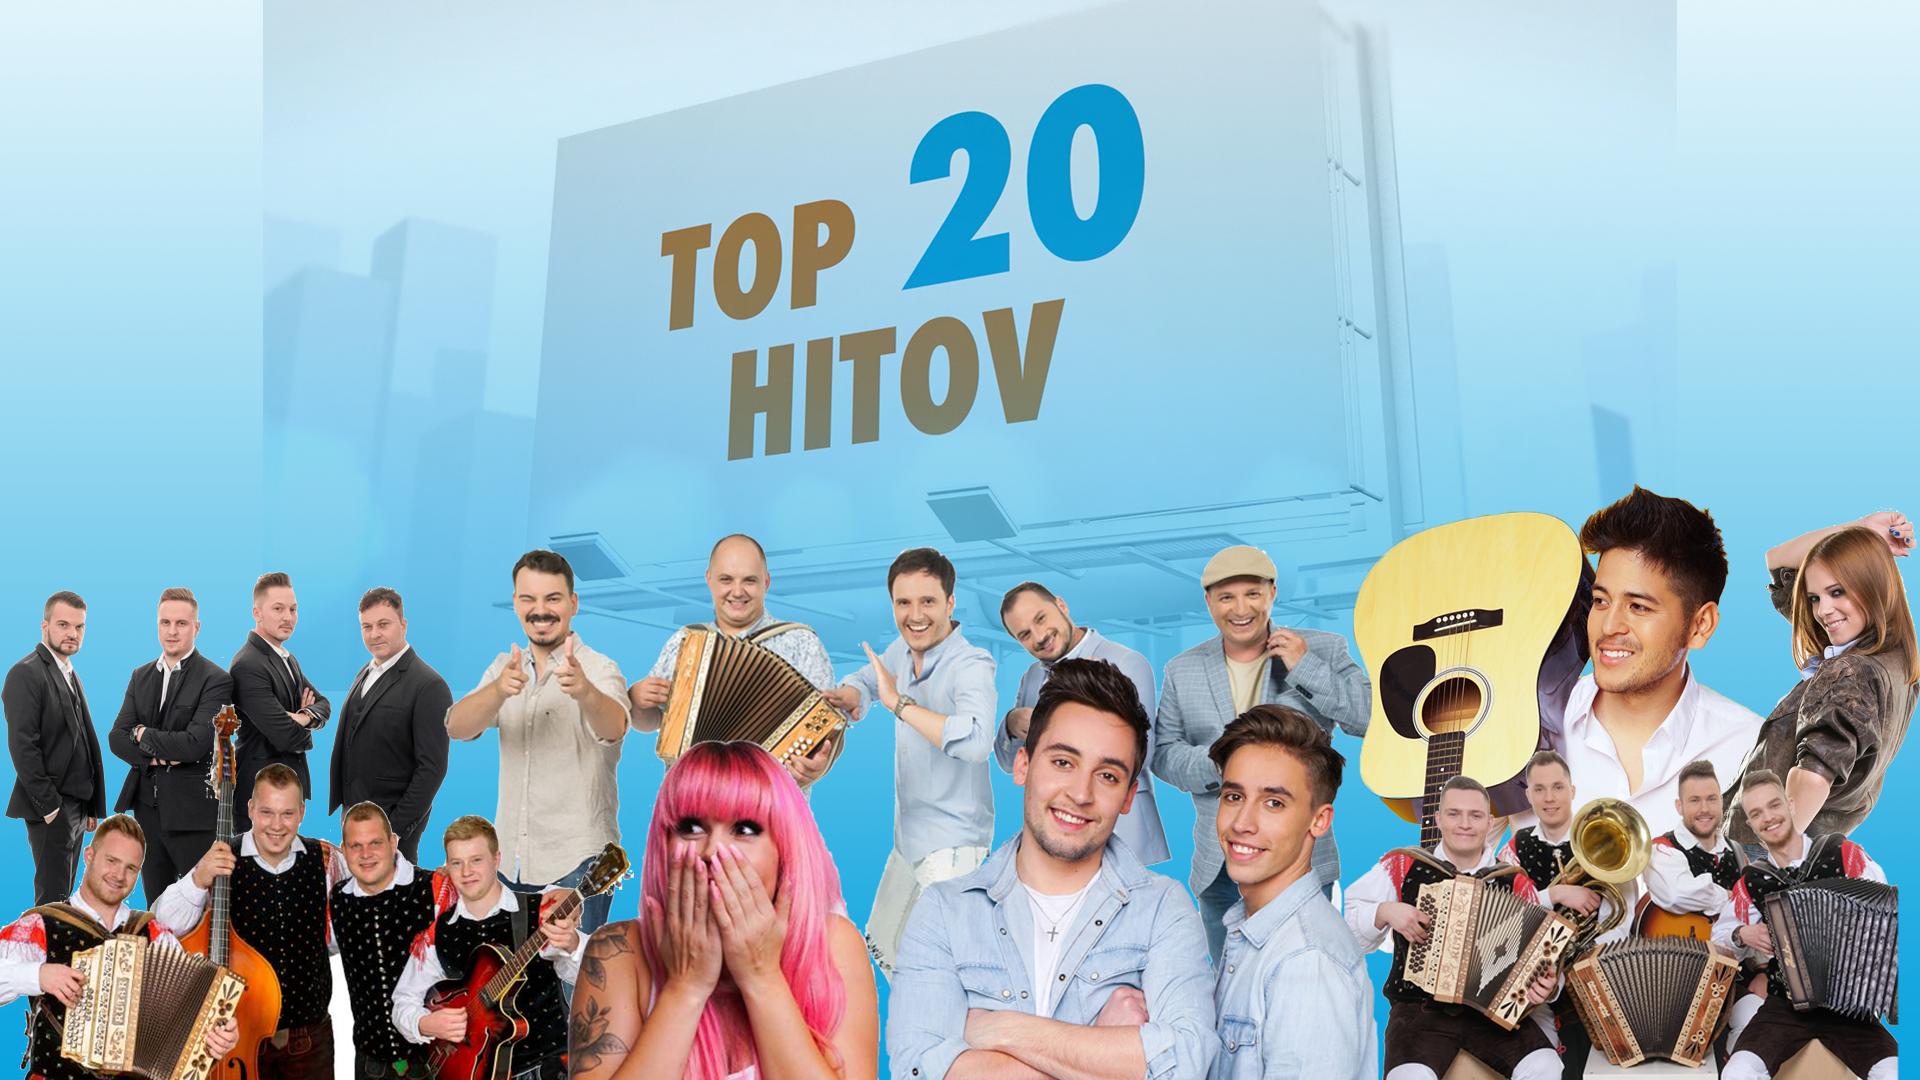 LESTVICA TOP 20